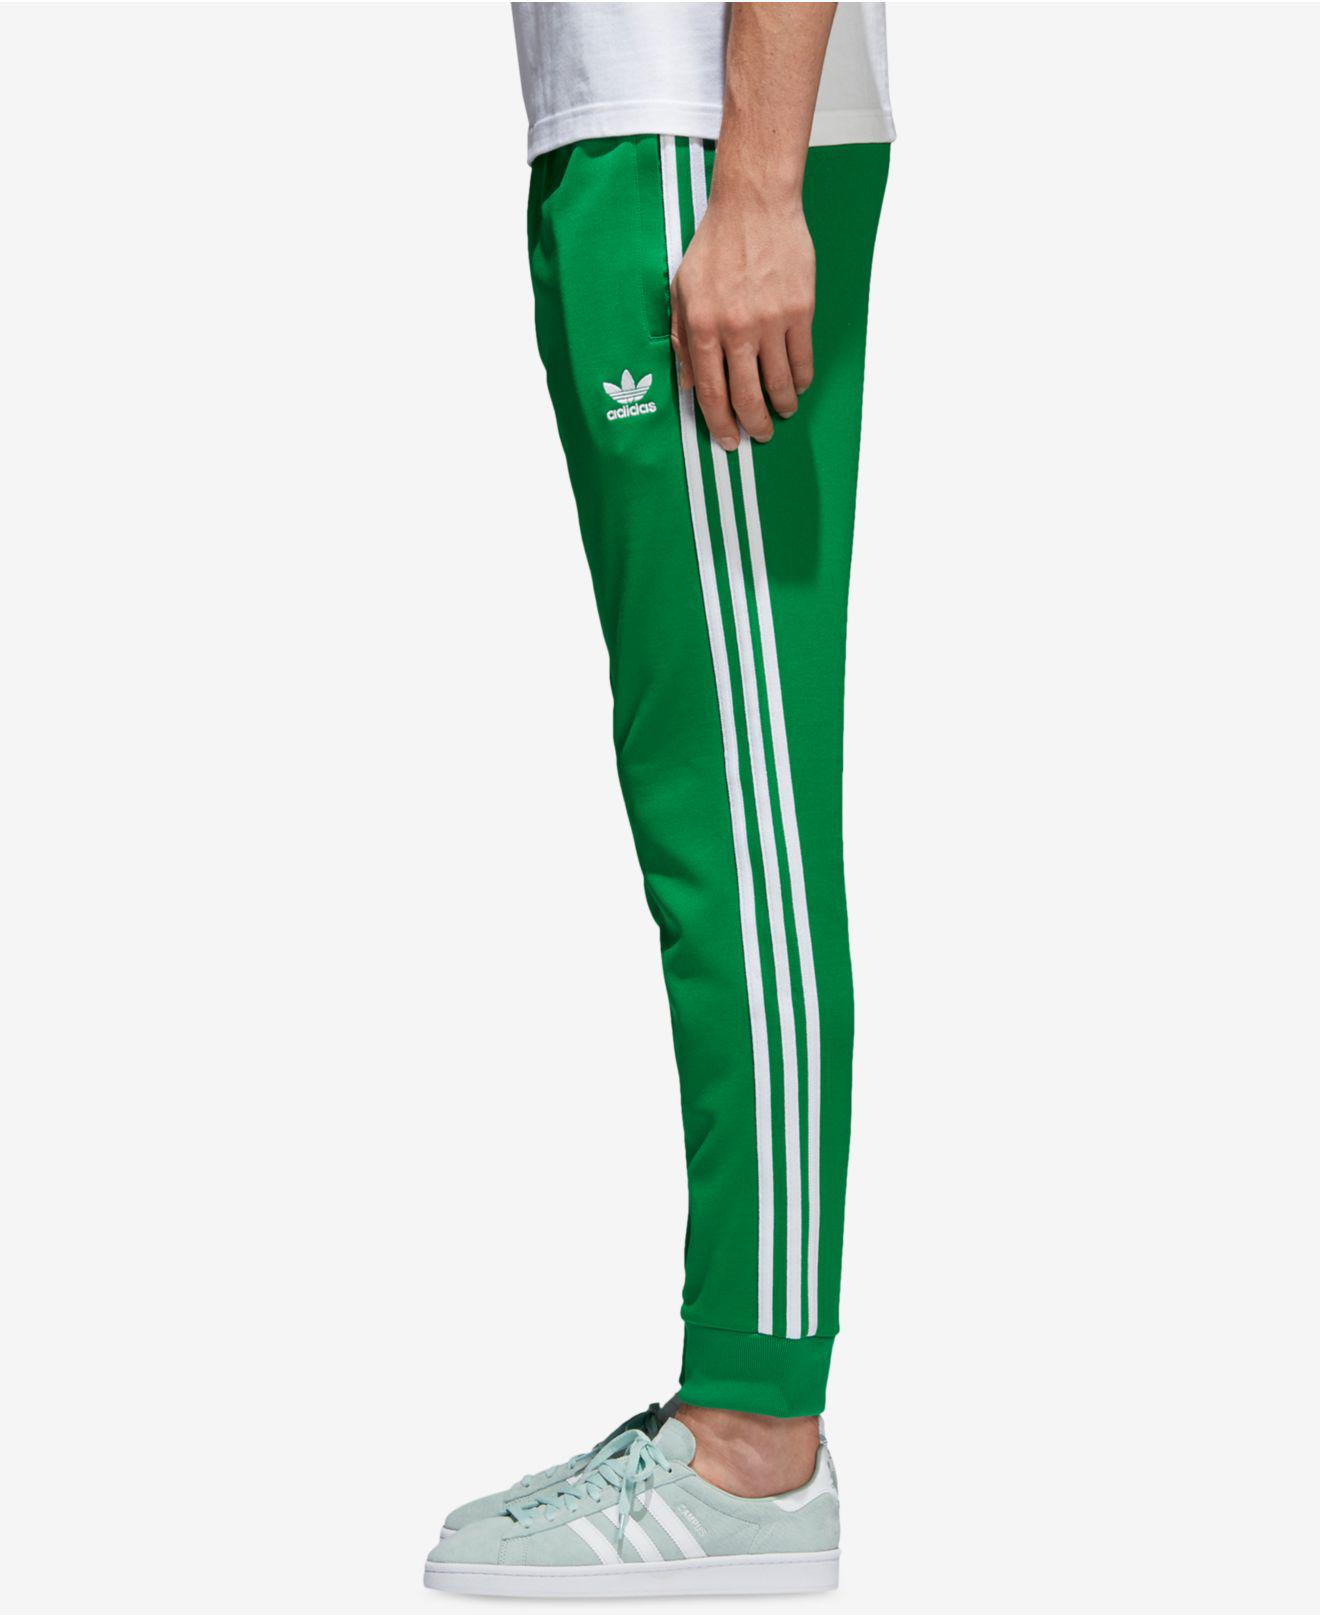 Lyst adidas hombres SST pista pantalones en verde para hombres